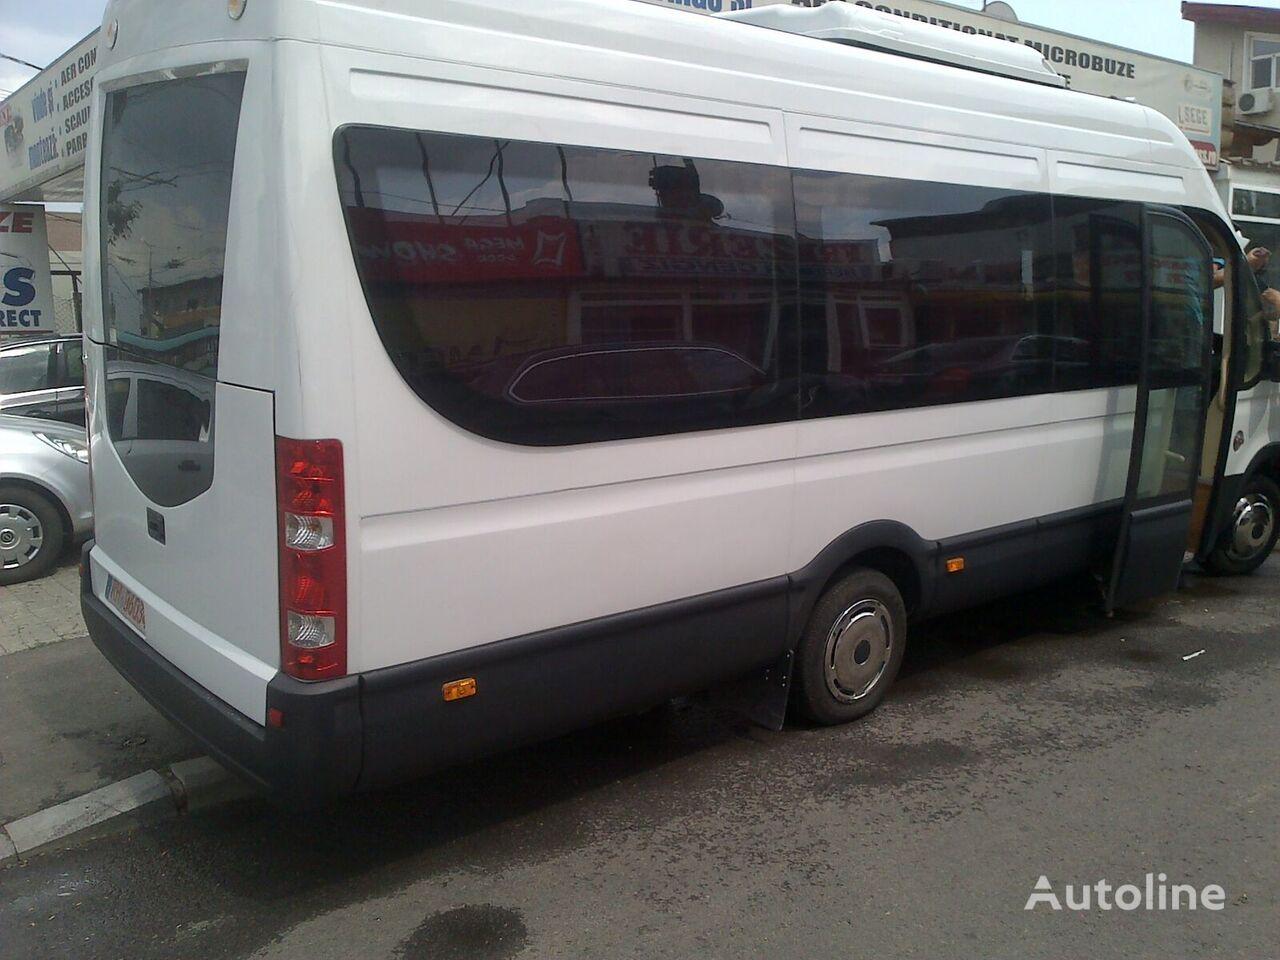 IVECO Daily 50C18, euro 5 EEV, 24 seats, Alungatto Kortrijk Edition sightseeing bus